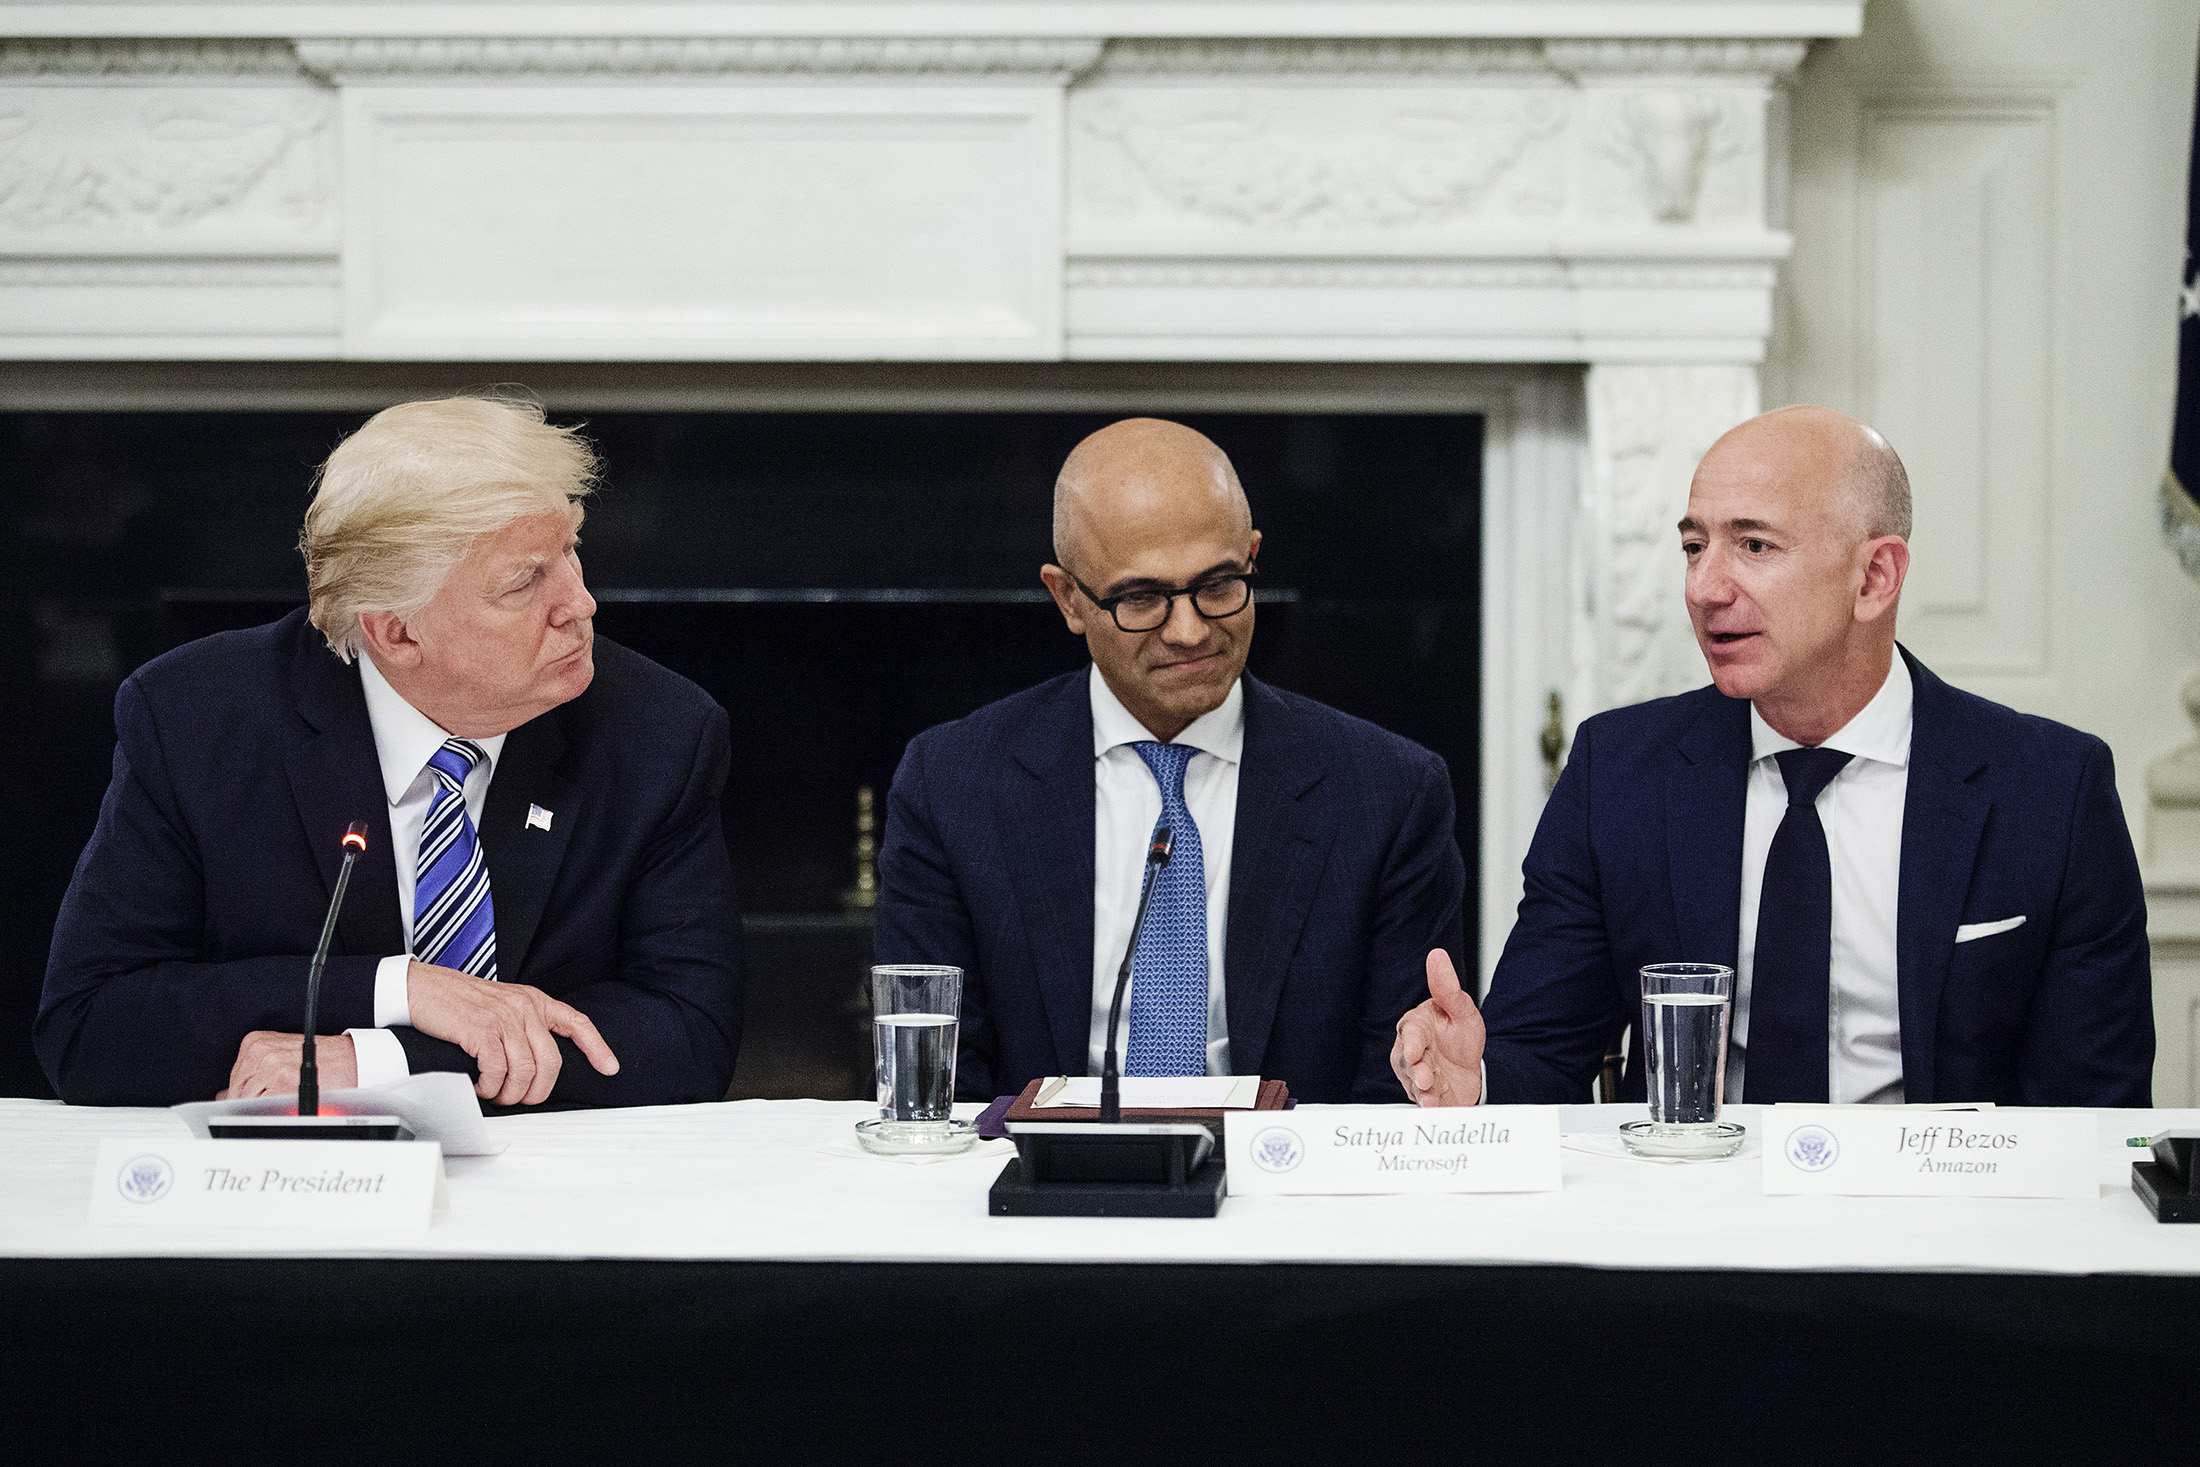 Amazon S Jeff Bezos Can T Beat Washington So He S Joining It